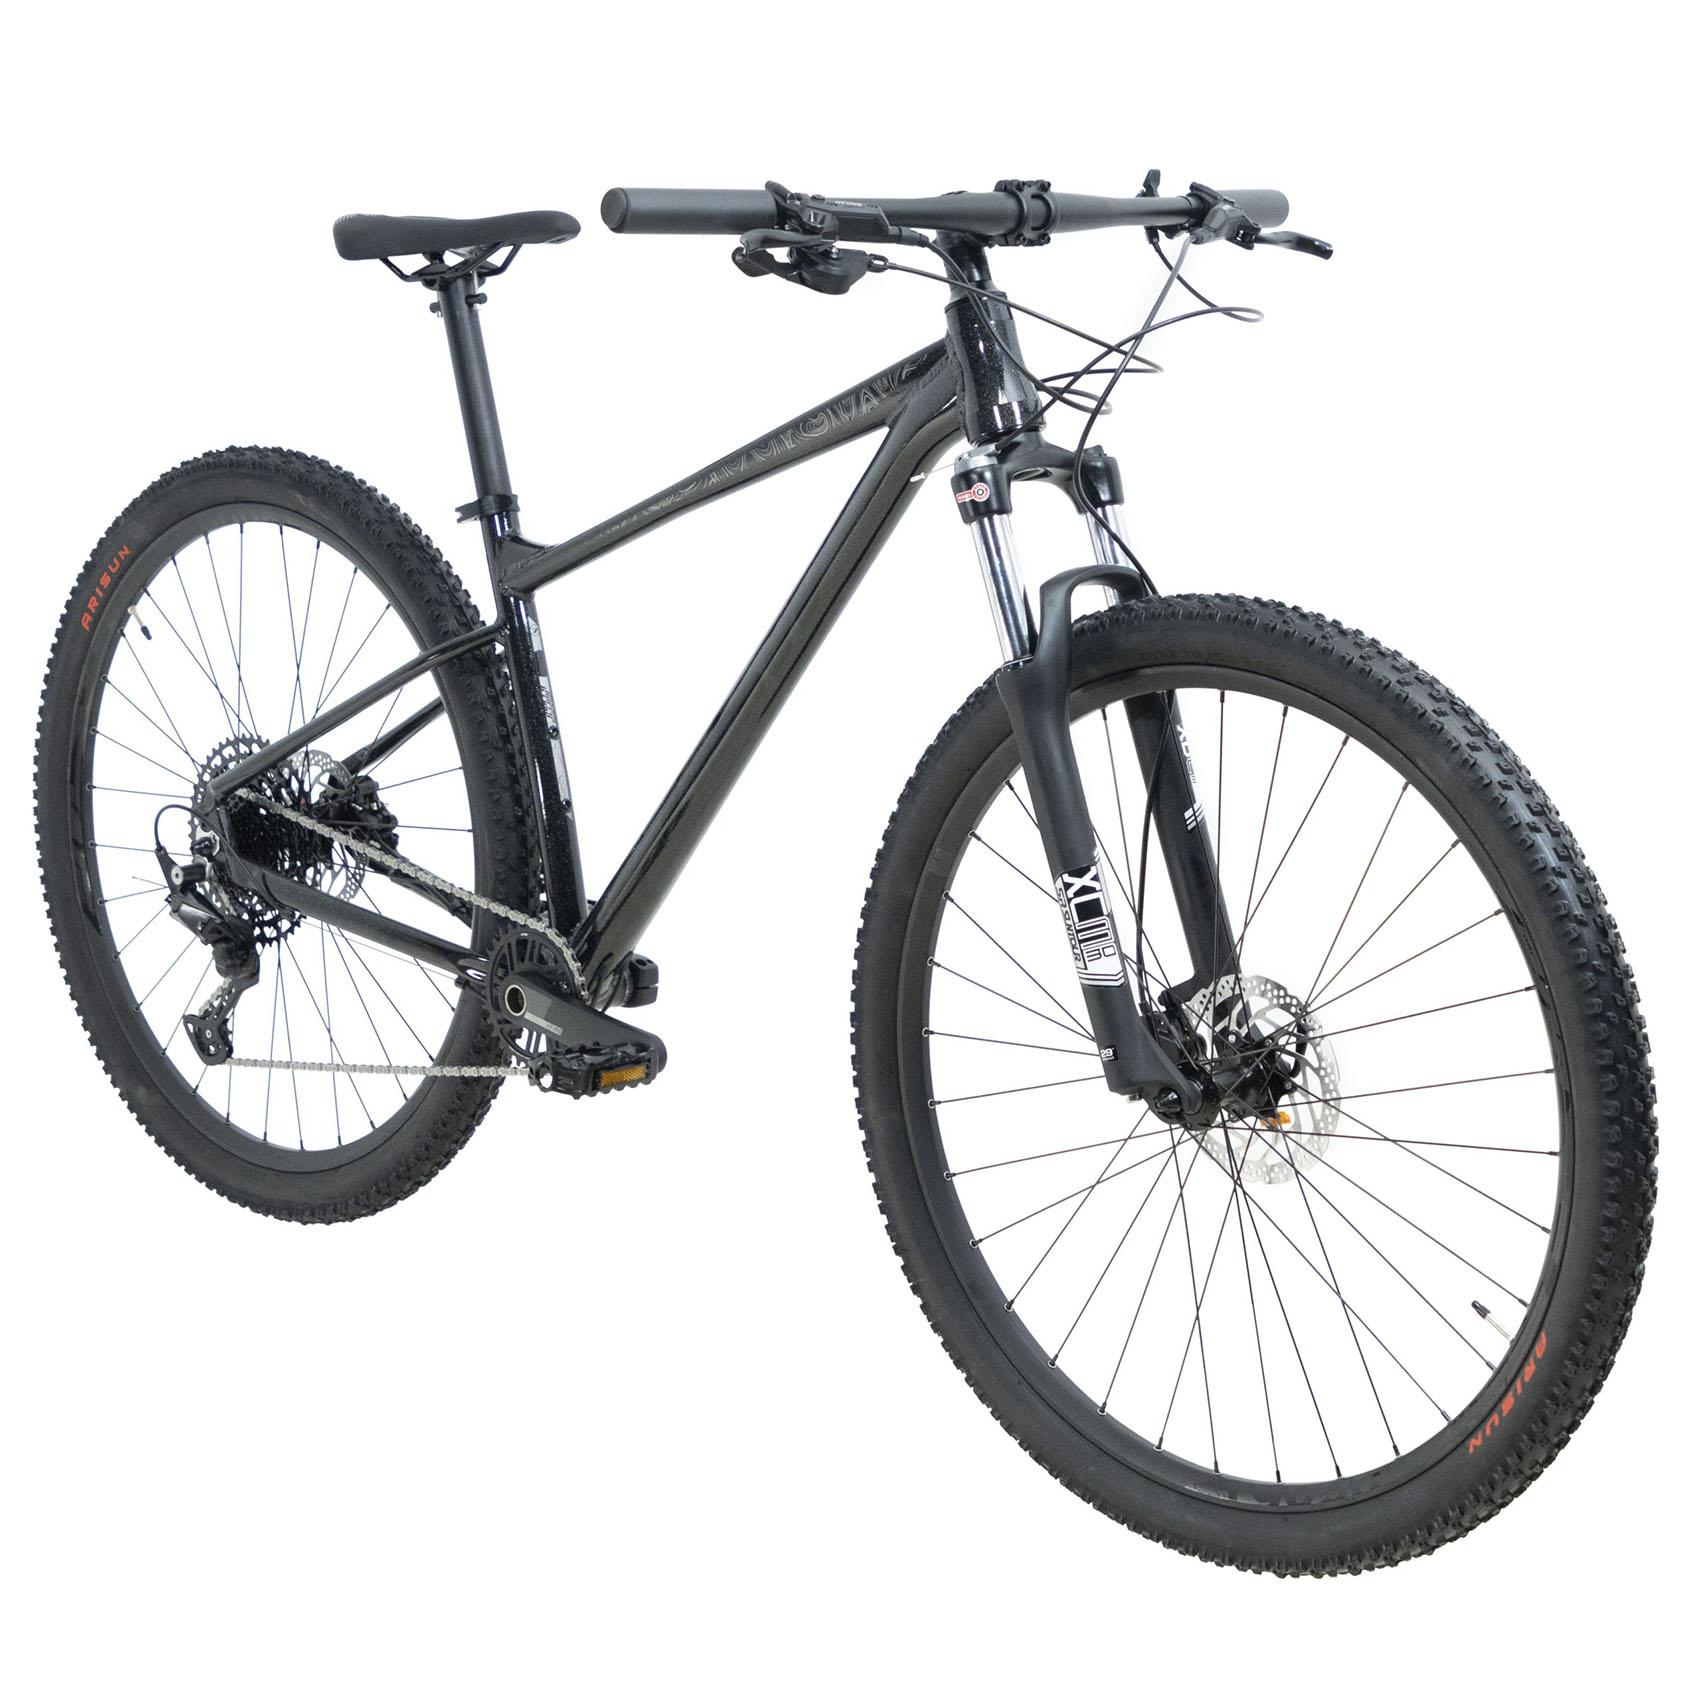 Bicicleta 29 Hurry SR-Suntour XCM  12v - TSW